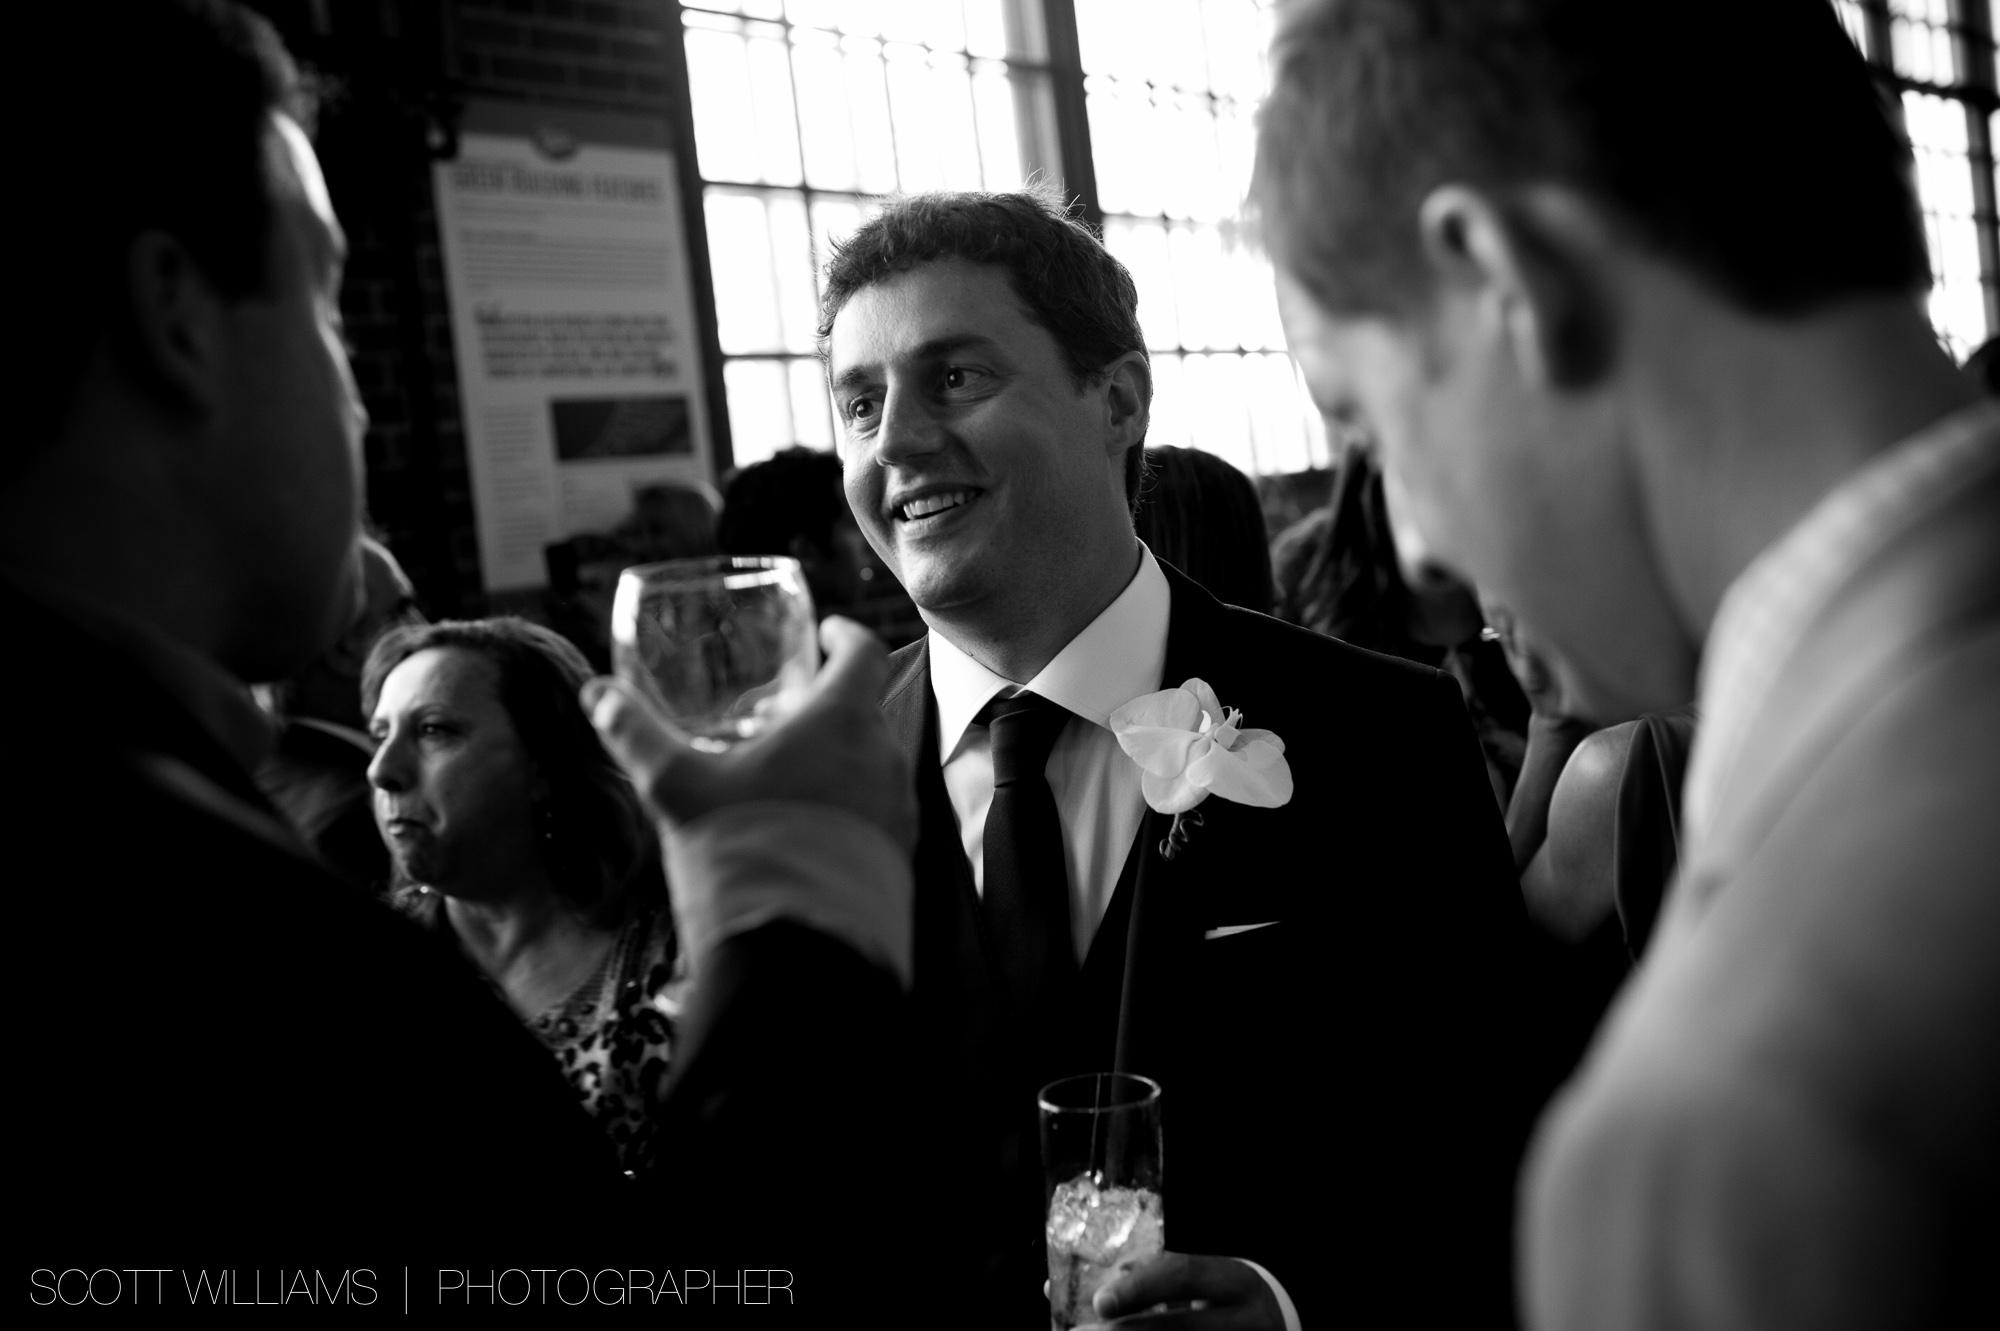 steamwhistle-brewery-wedding-toronto-009.jpg